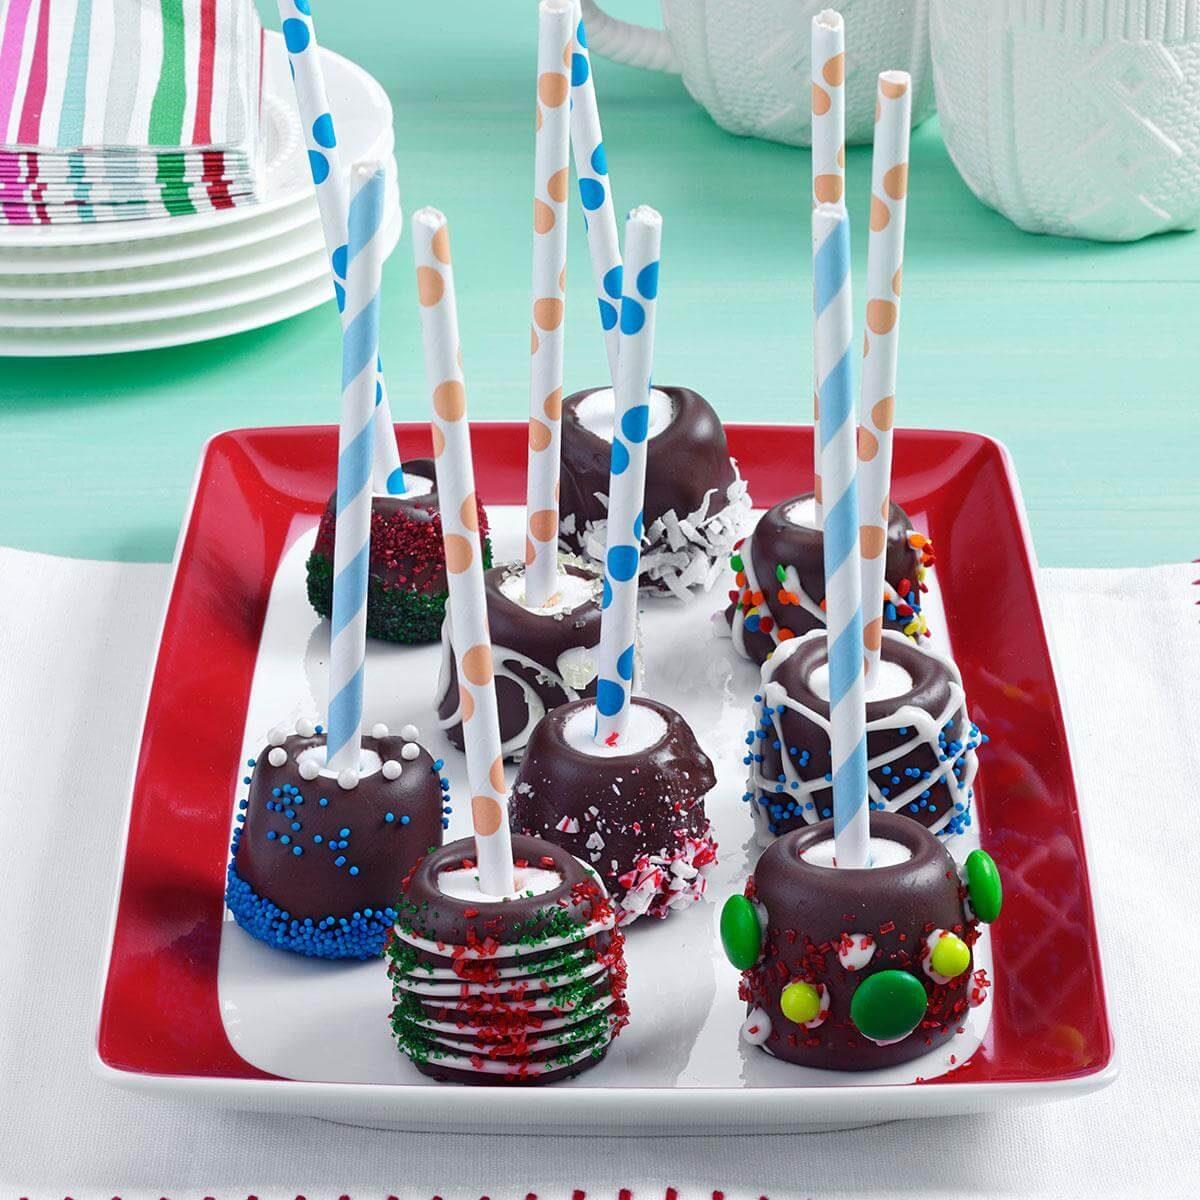 Chocolate Marshmallows Dunmore Candy Kitchen: Chocolate-Topped Marshmallow Sticks Recipe